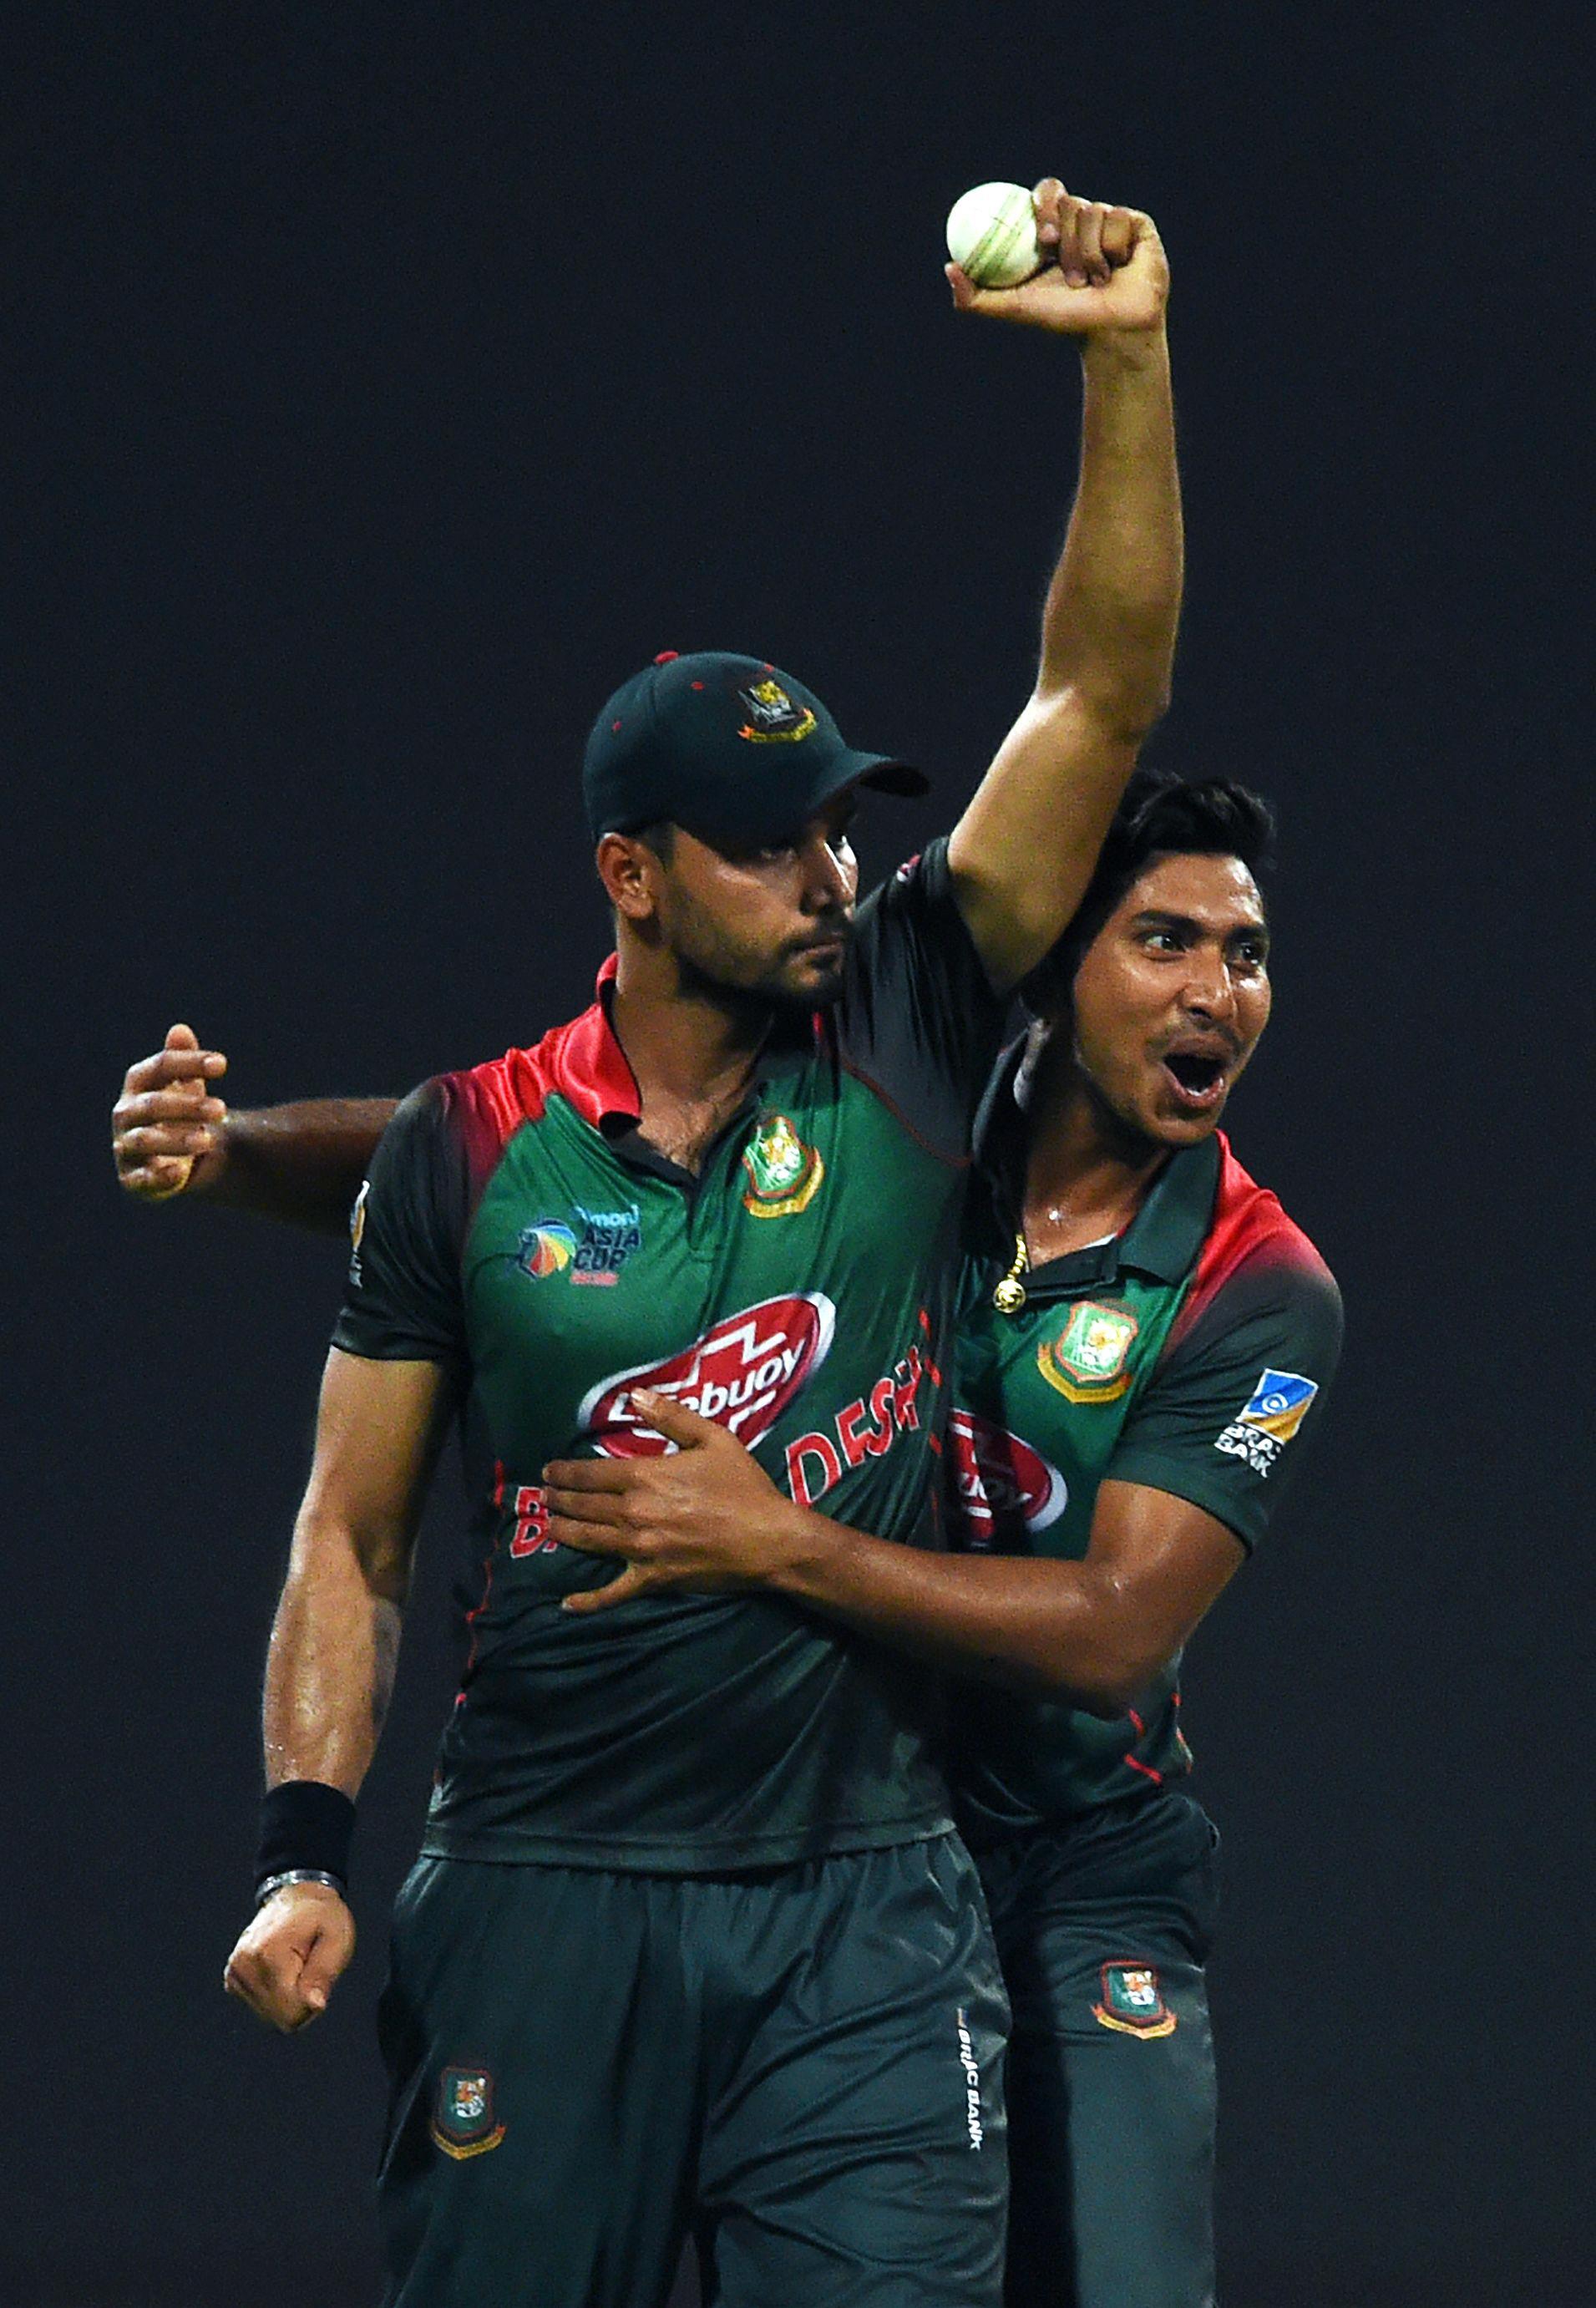 Bangladesh's captain Mashrafe Mortaza (L) celebrates   after he dismissed Pakistan's batsman Shoaib Malik